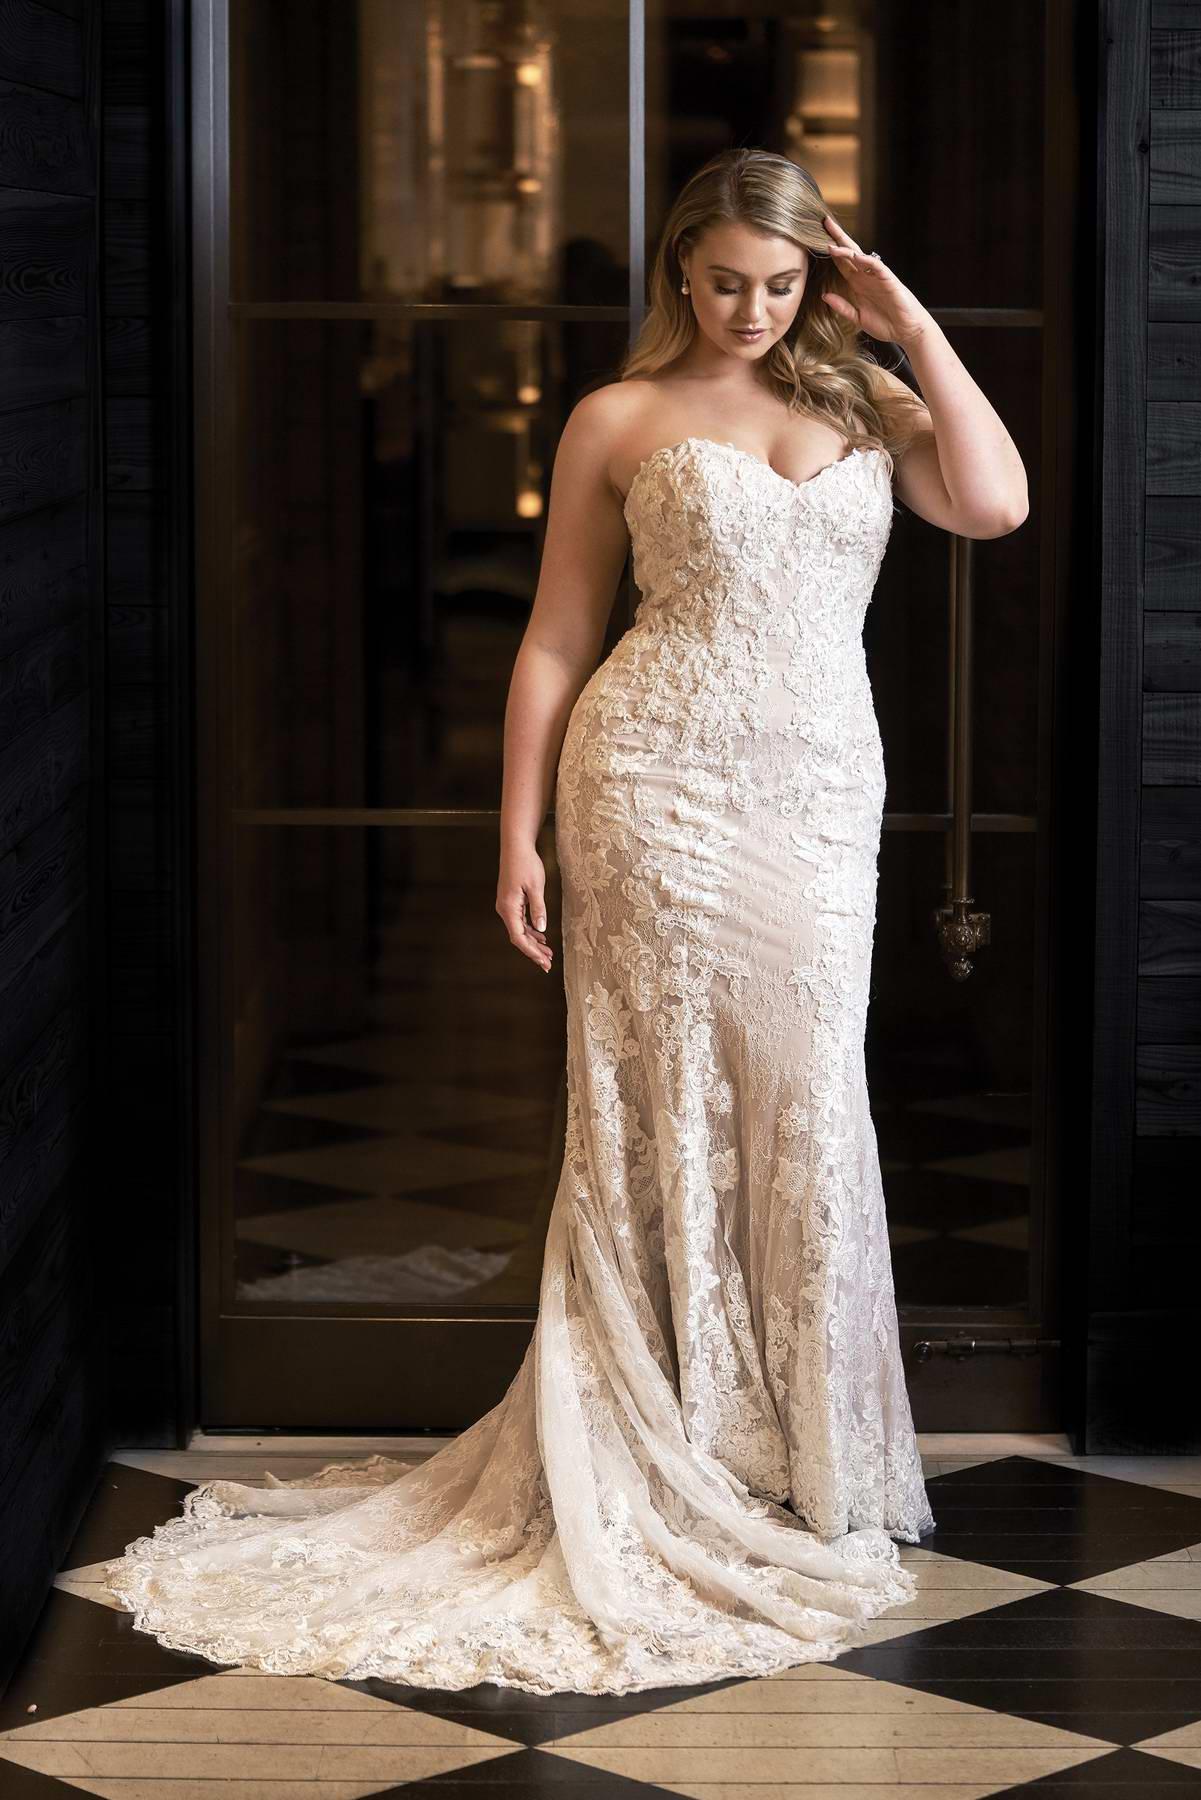 Iskra Lawrence in Justin Alexander 2018 Bridal Campaign